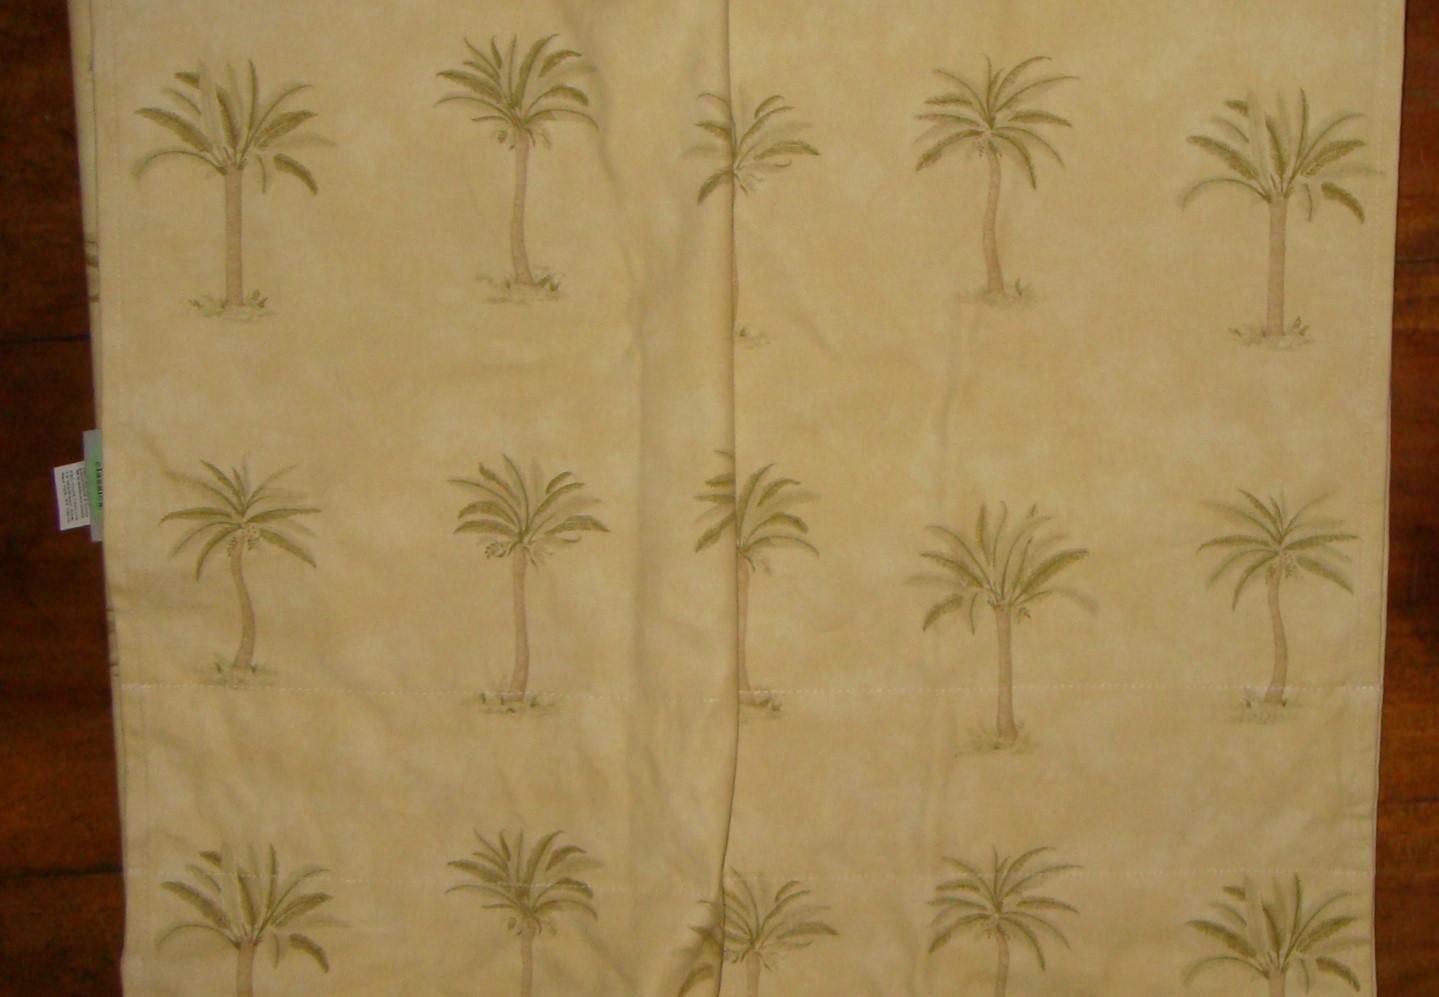 Waverly Tahiti Palm Trees Window Treatment Valance Classics Yellow Green Curtains Drapes